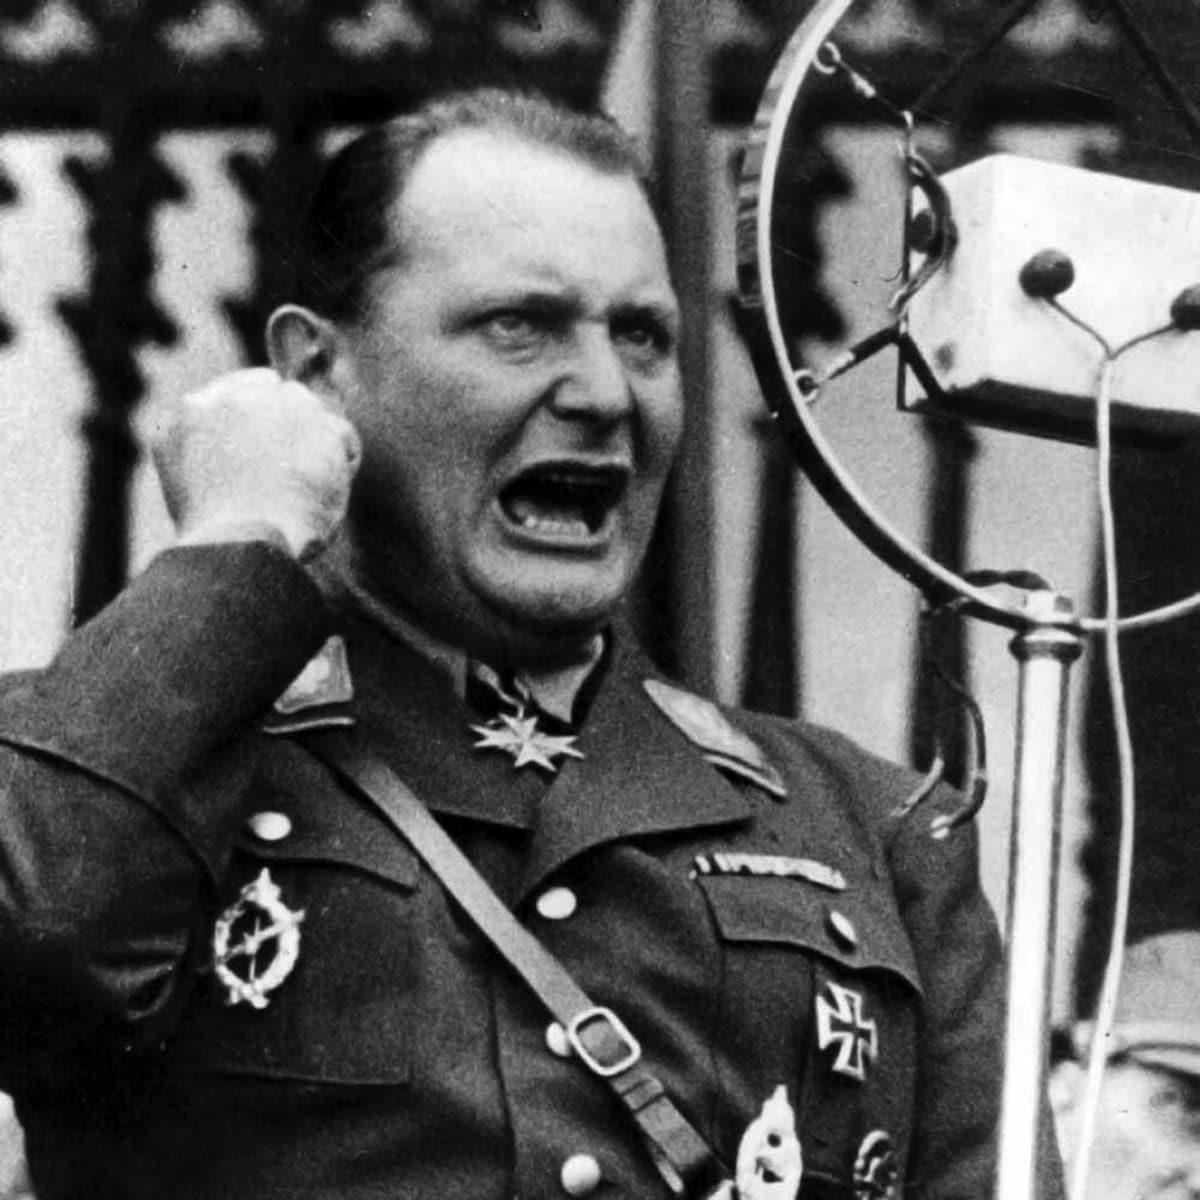 hermann goering nazi party